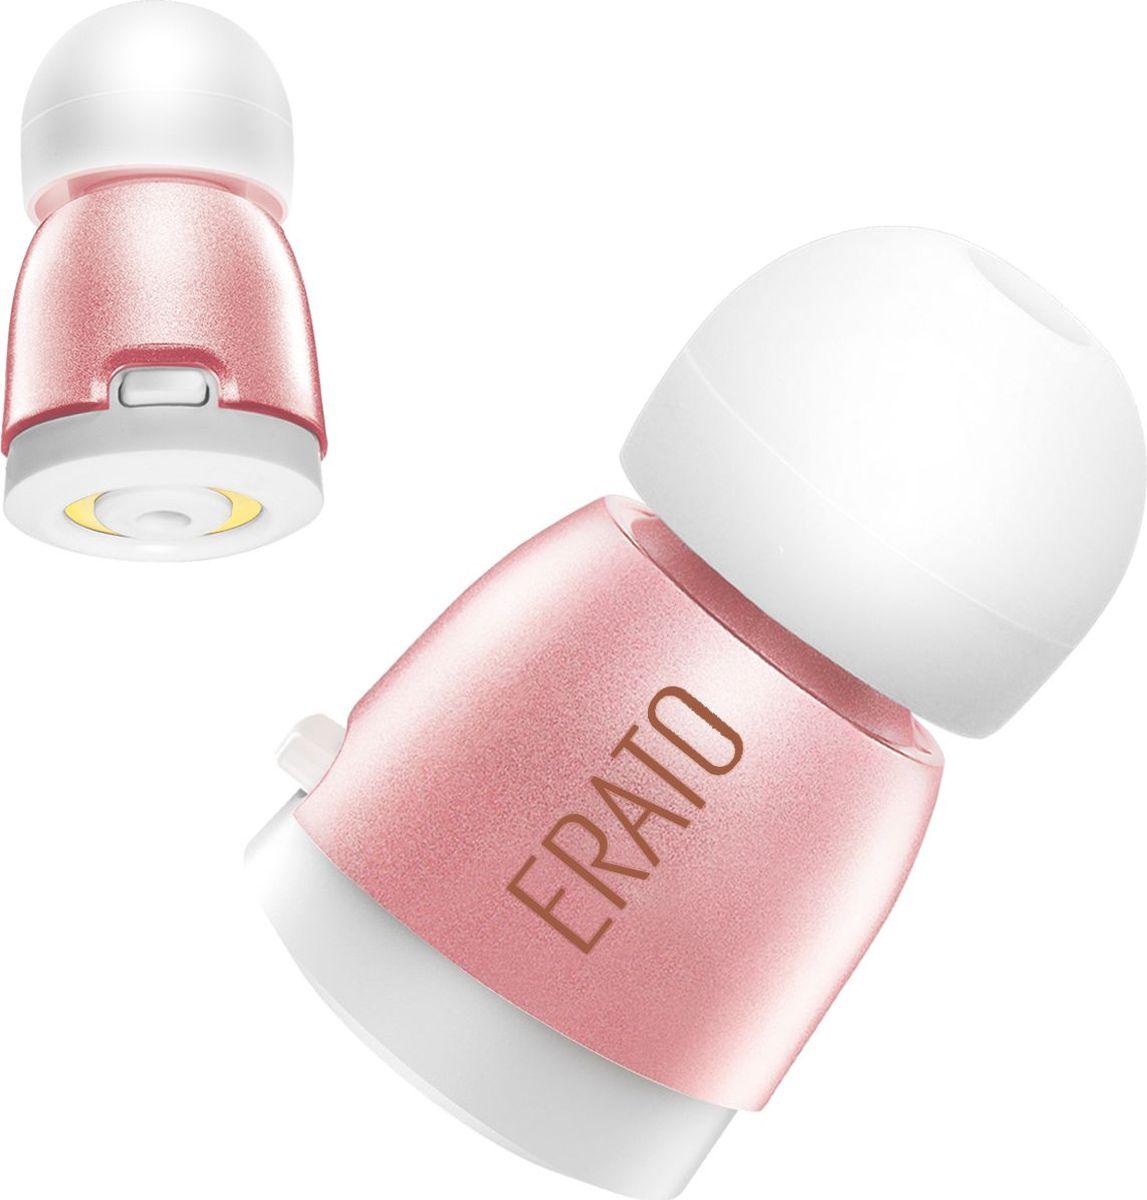 Erato Muse 5, Pink беспроводные наушники наушники беспроводные beats solo3 wireless on ear neighborhood collection break blue mq392ze a